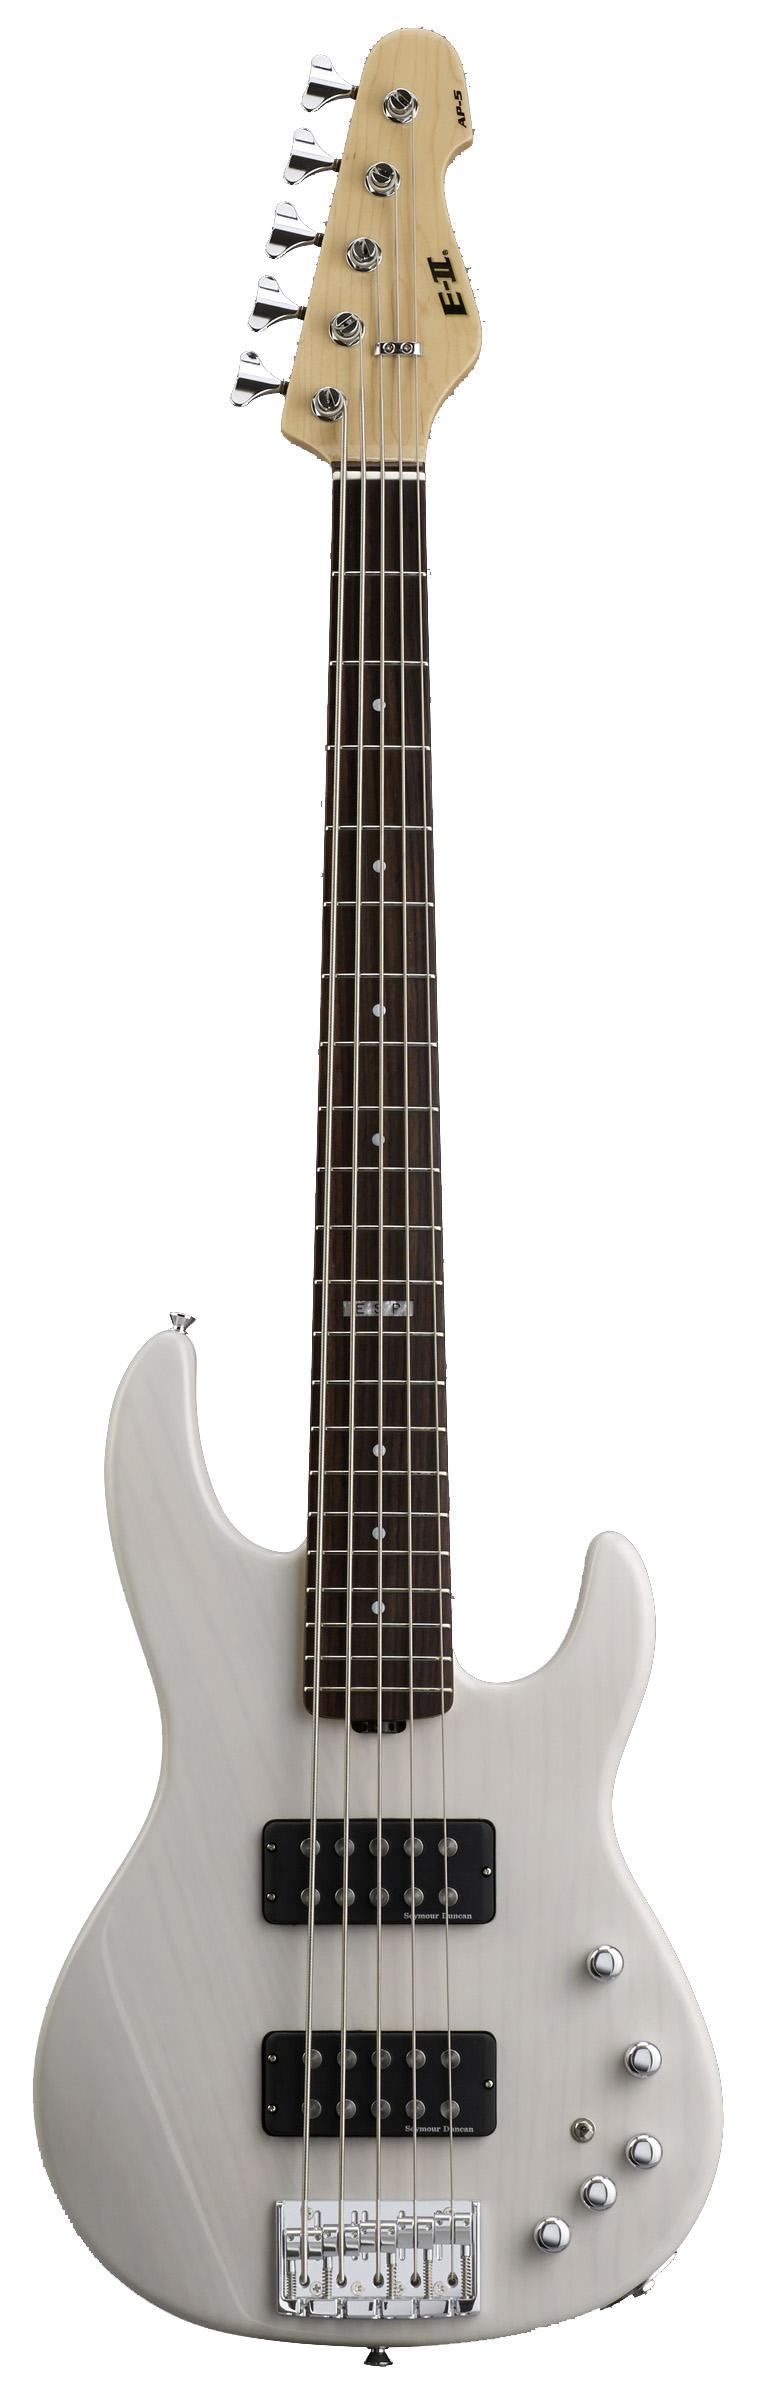 ESP AP-5 STW E-II AP Series 5-String 21 XJ Frets Electric Bass Guitar with See Thru White Finish